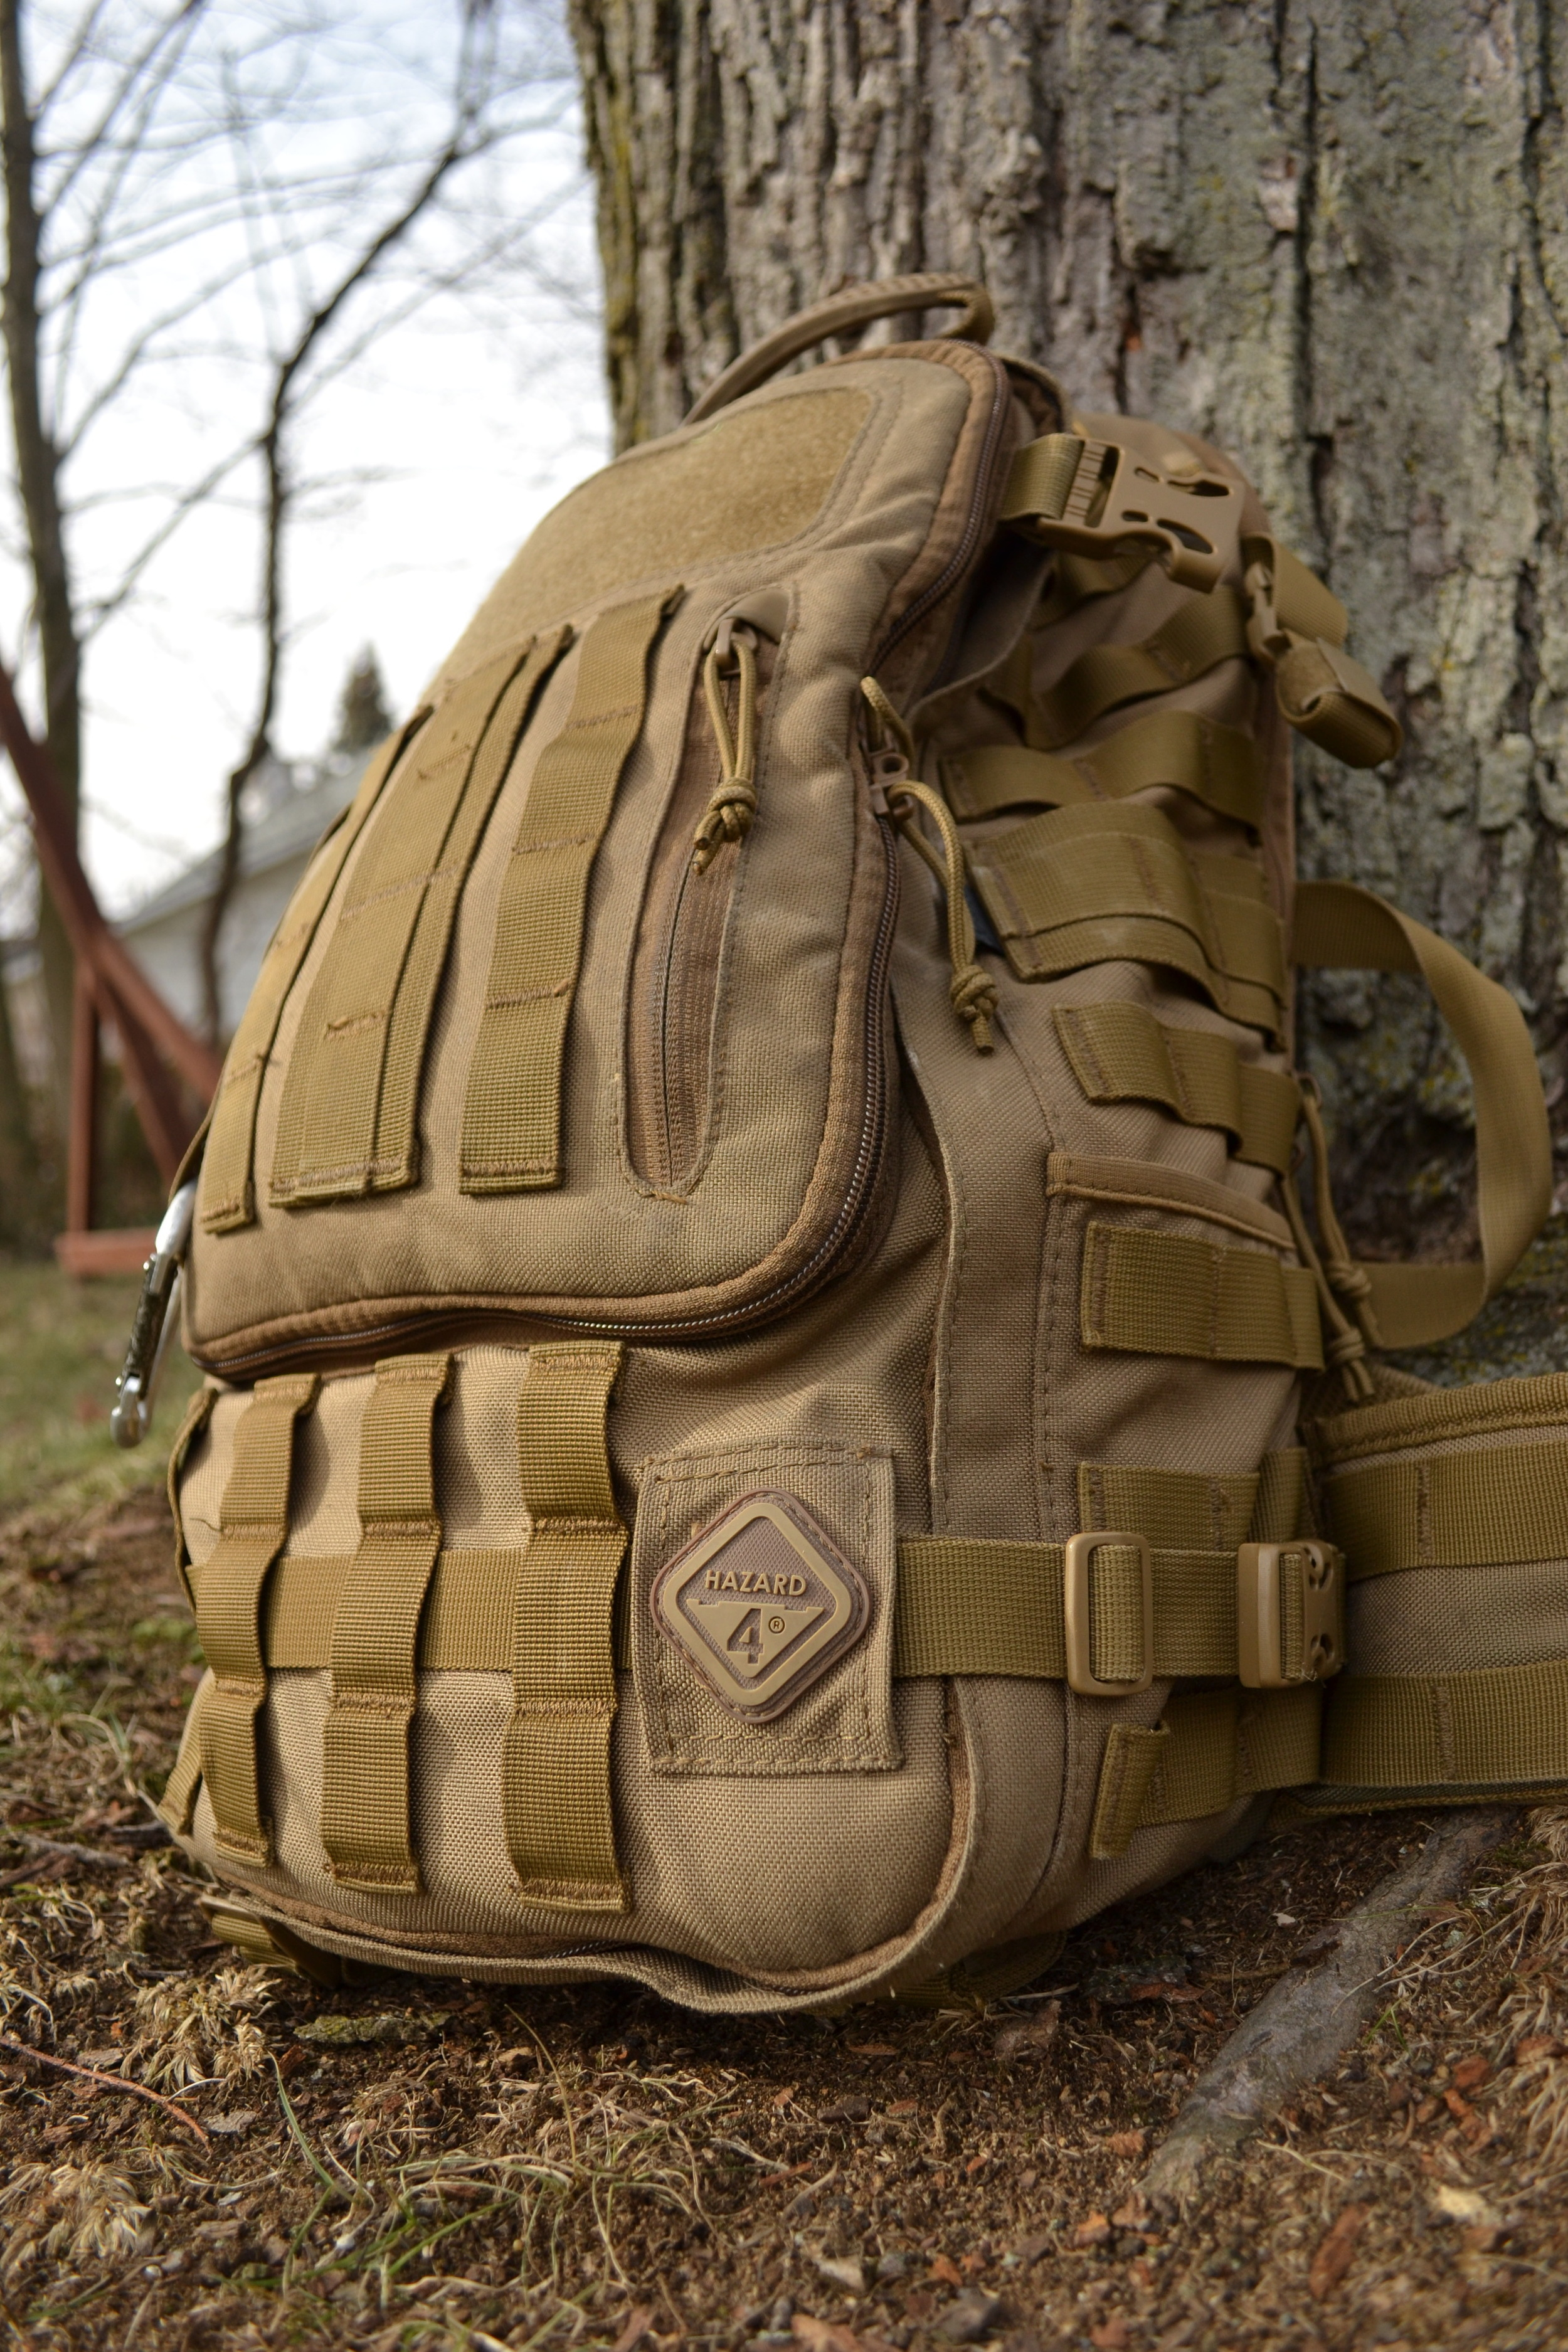 Hazard 4 Switchback backpack